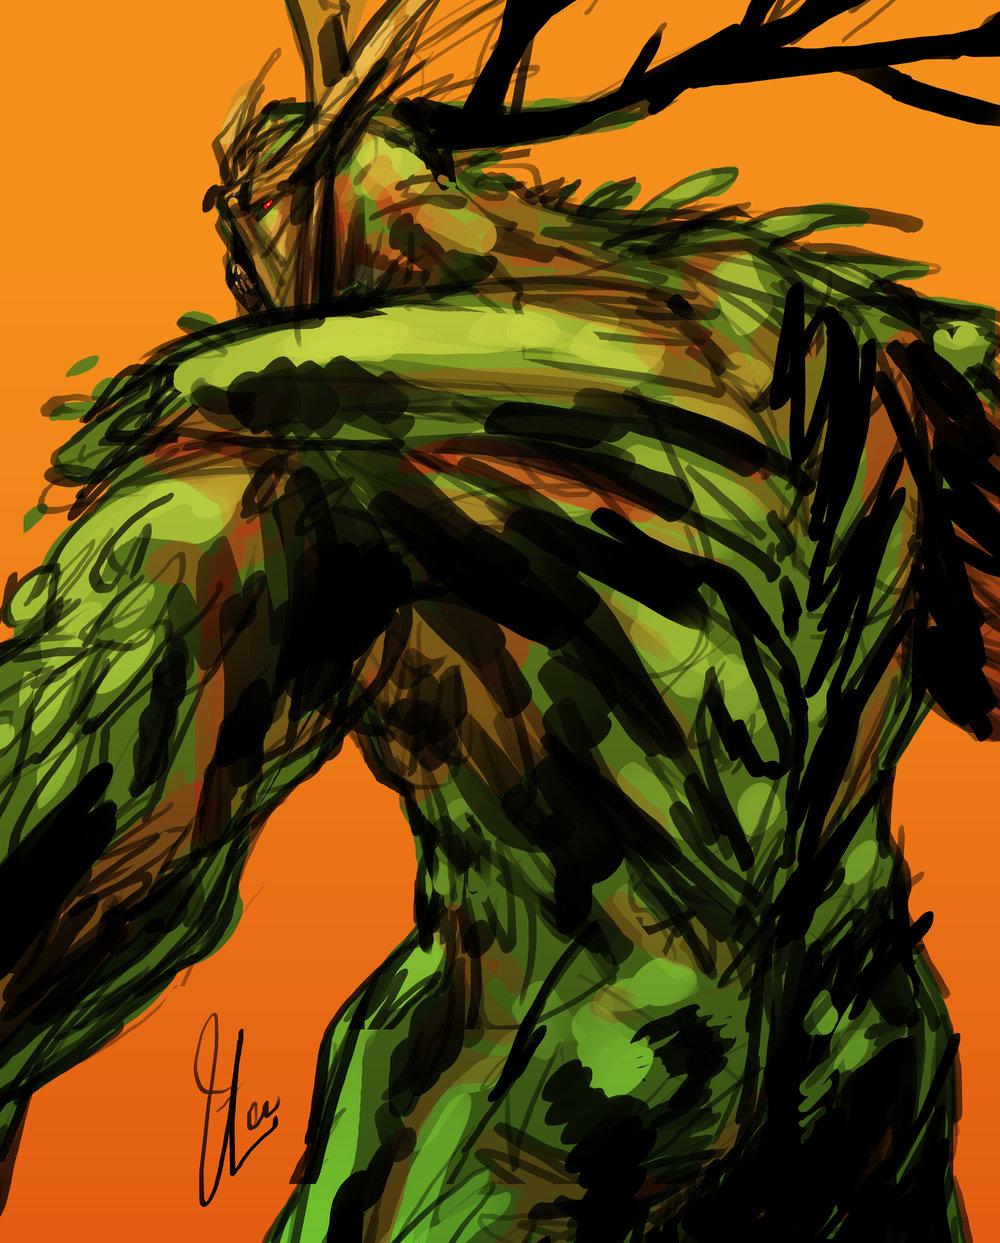 Swamp Thing 8x10.jpg